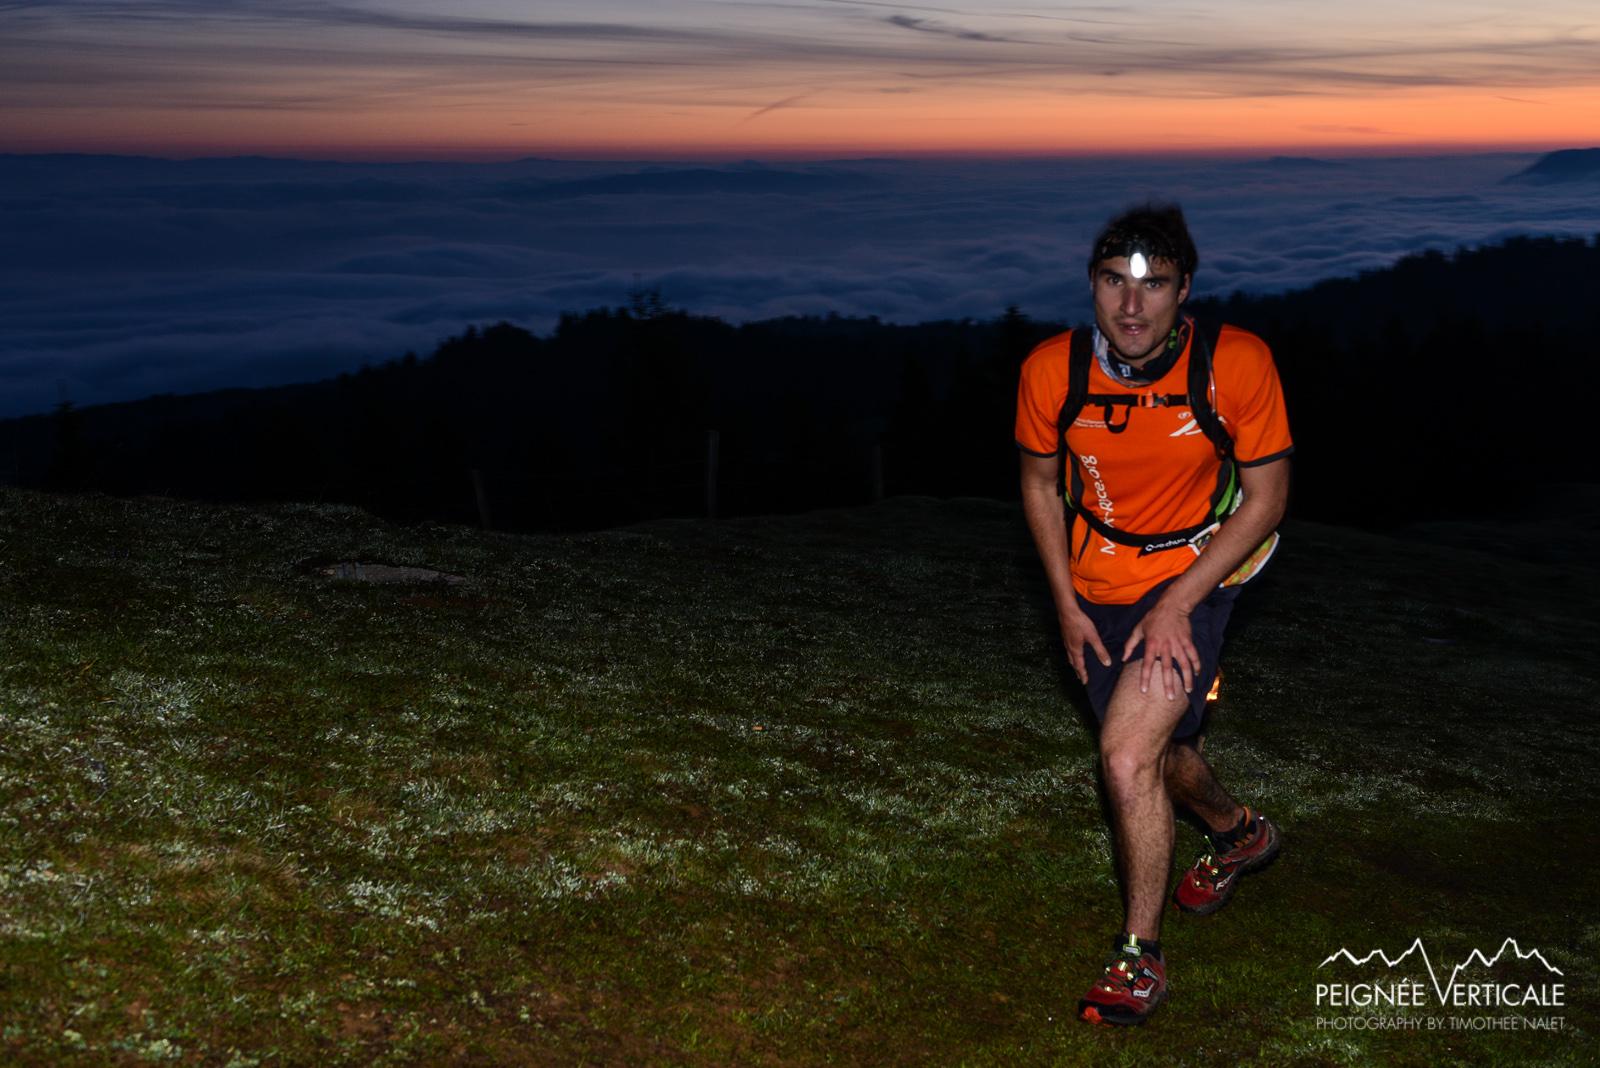 MaxiRace-Annecy-2014-Team-Hoka-Timothee-Nalet-0774.jpg